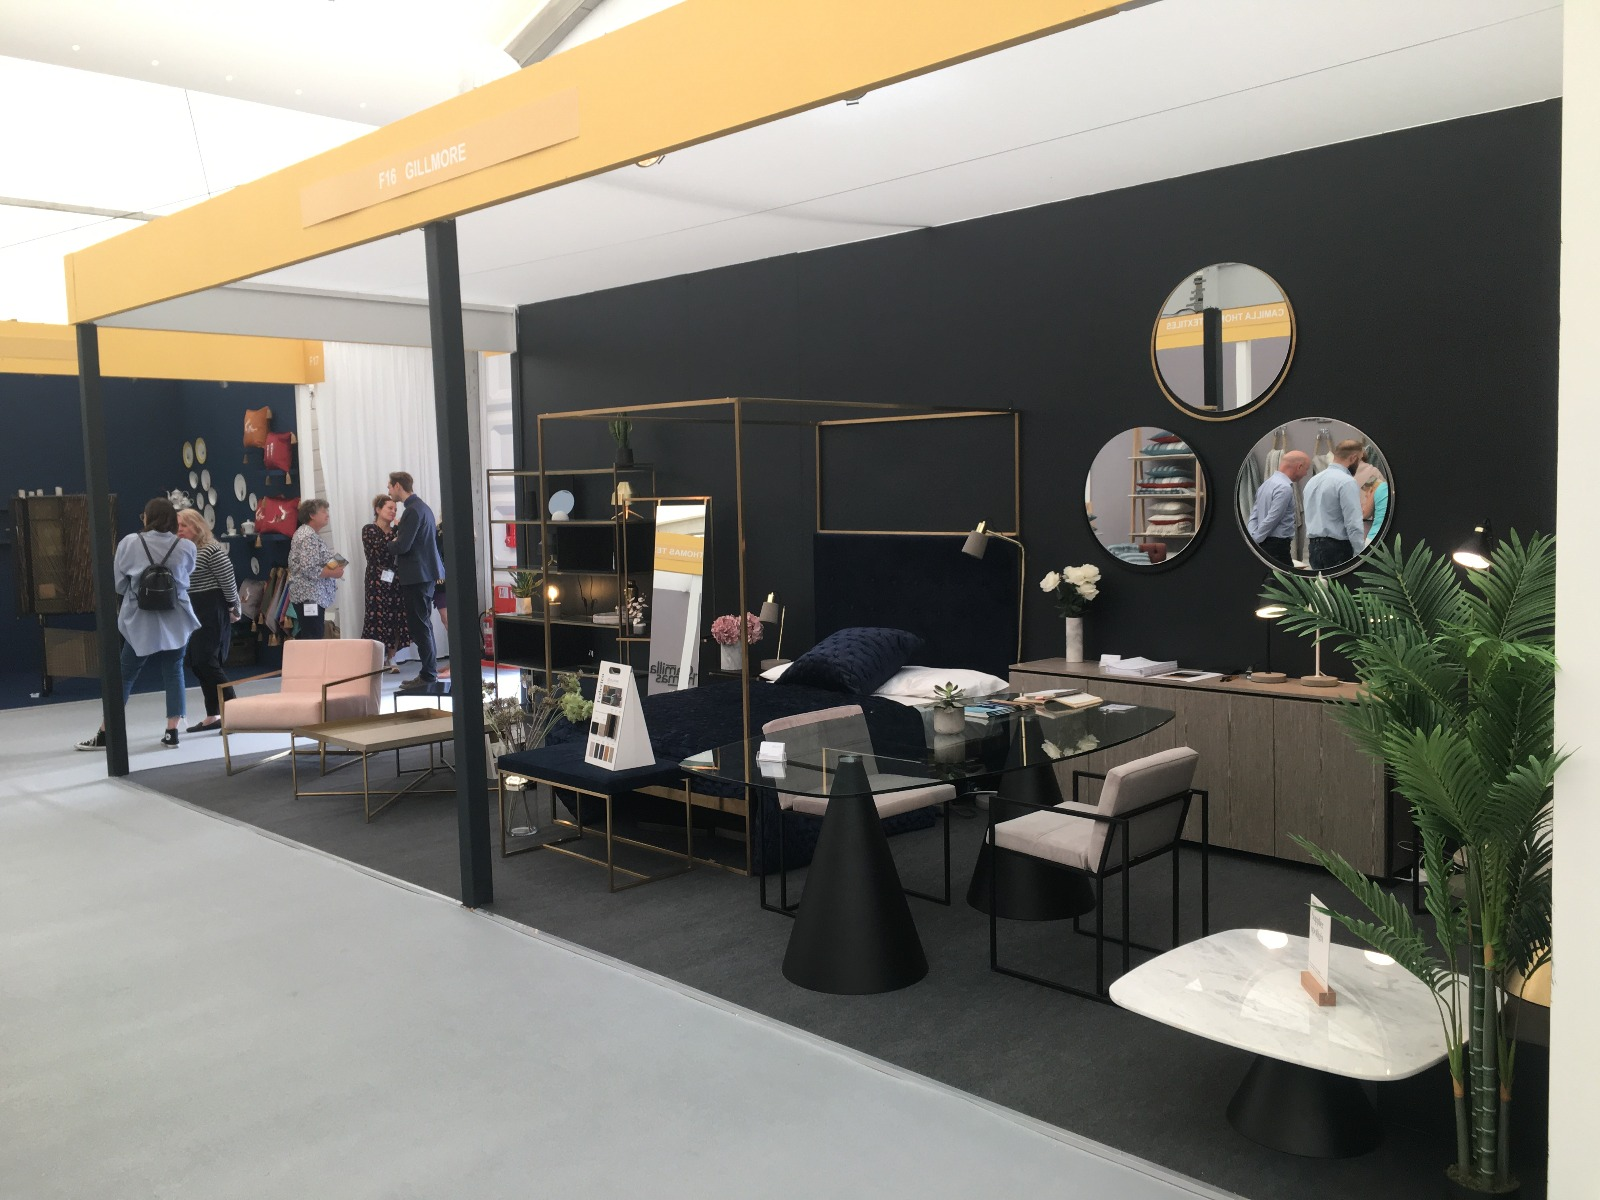 Gillmore Stand F16 - Decorex International 2018, London